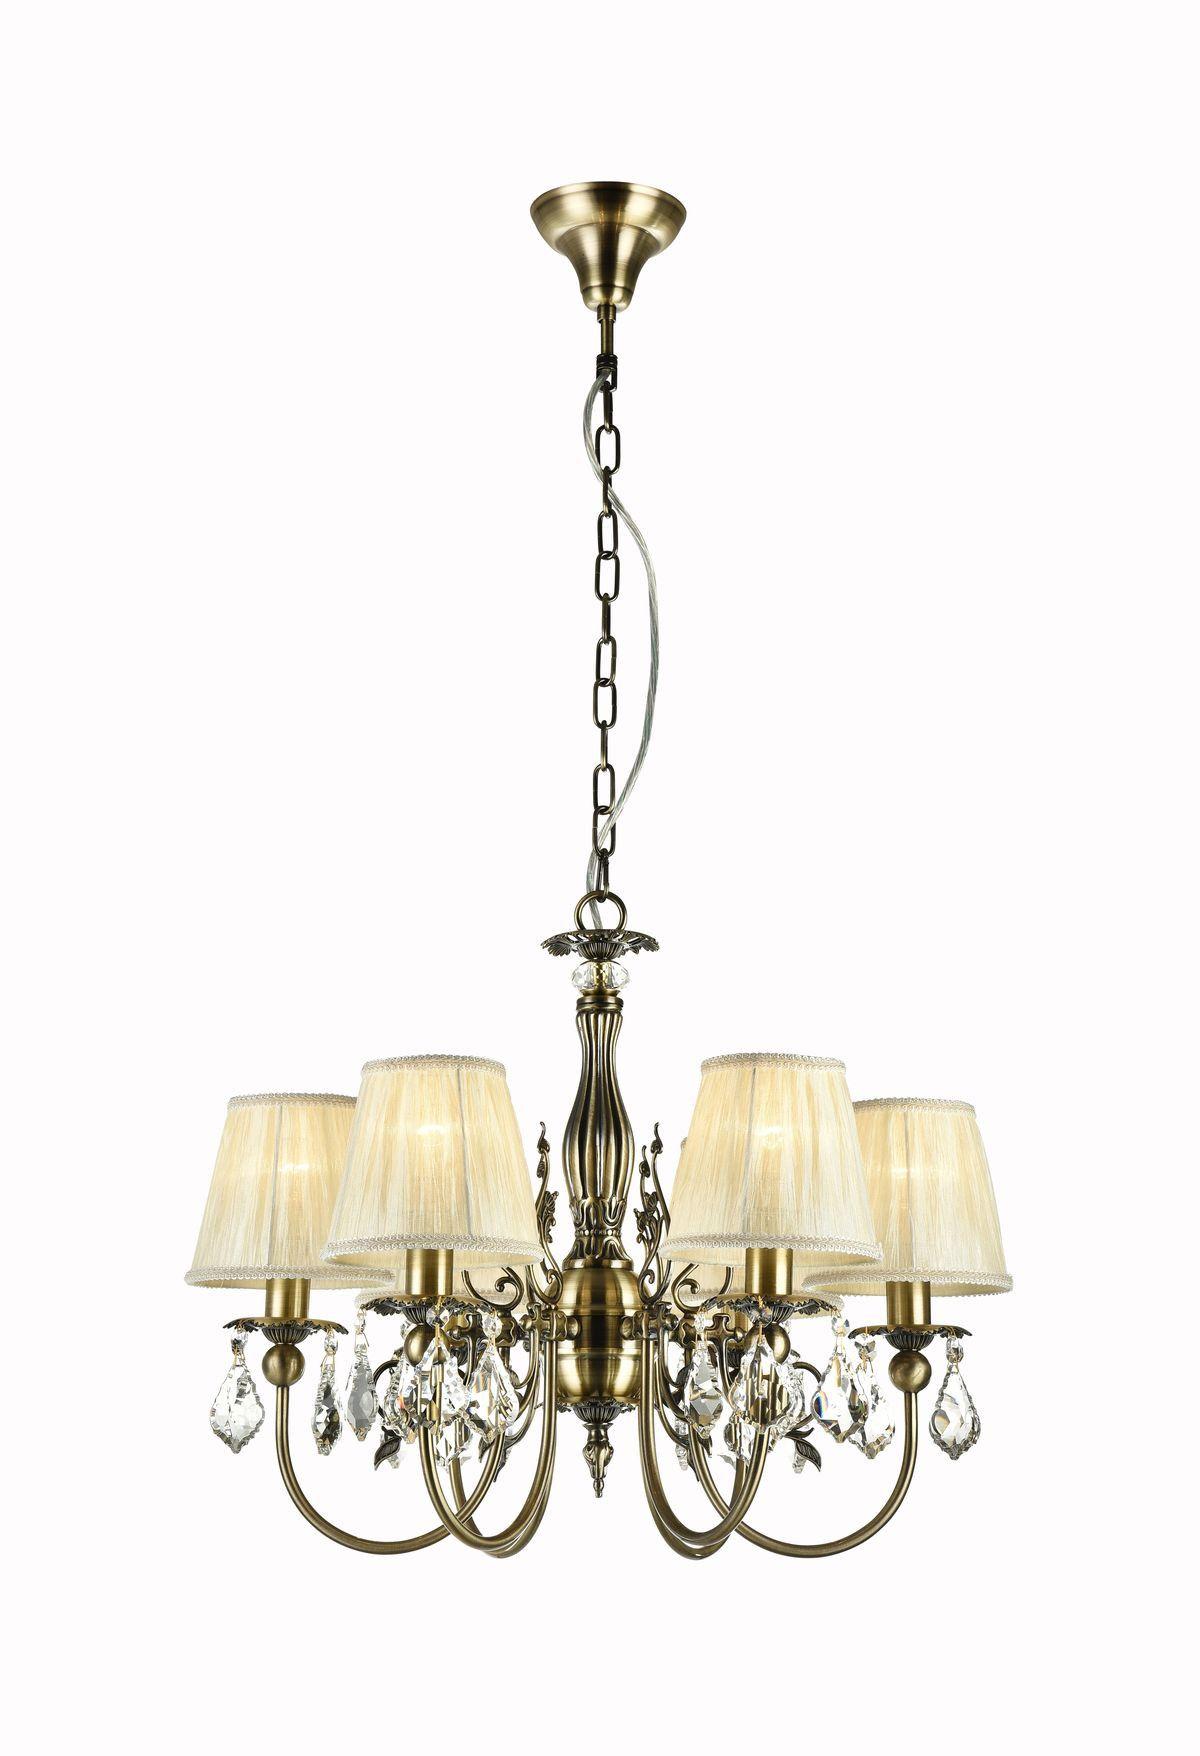 Elegant Kronleuchter Latona Bronze #kronleuchter #schirm